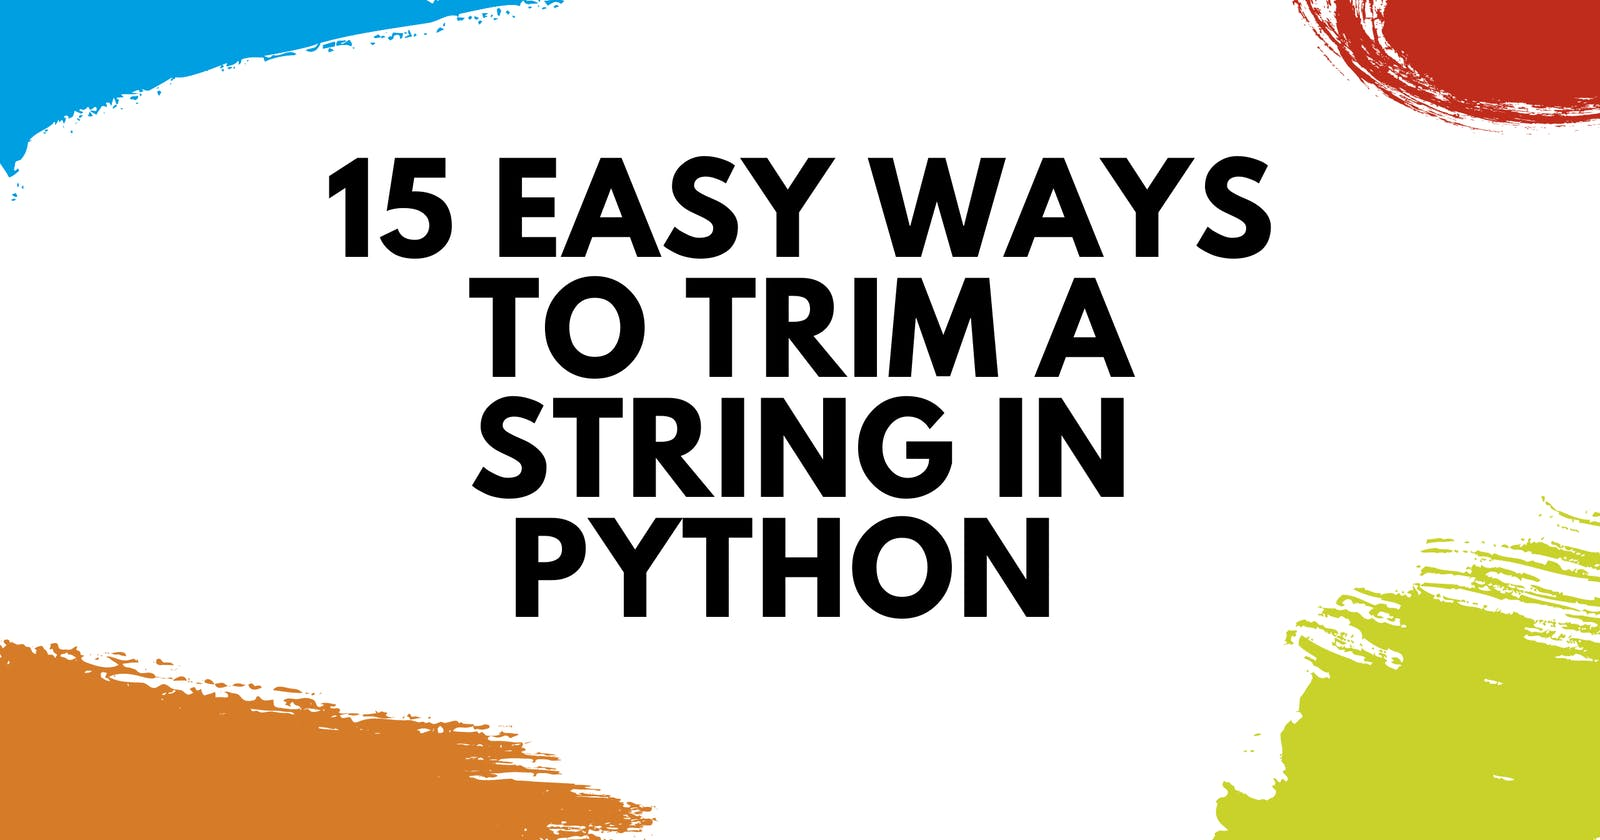 15 Easy Ways to Trim a String in Python